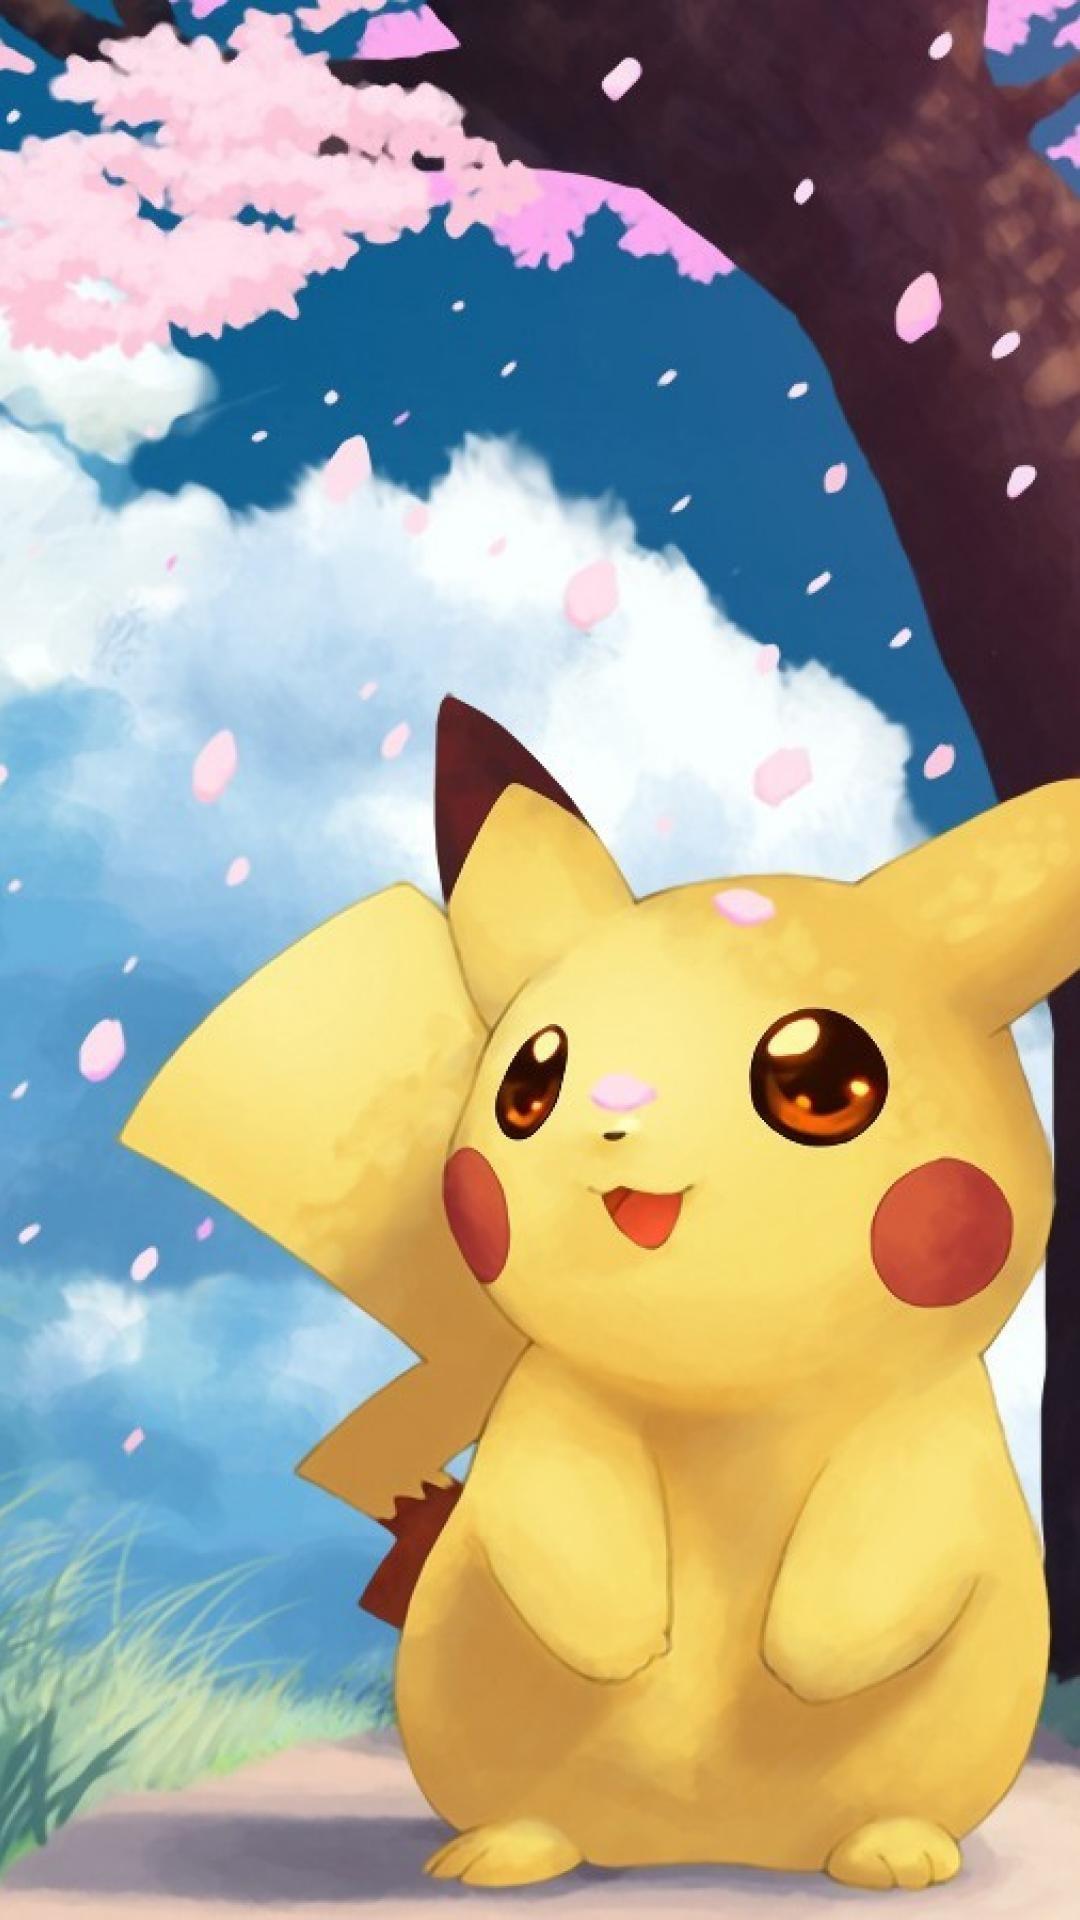 Pokemon Cool iPhone x wallpaper hd